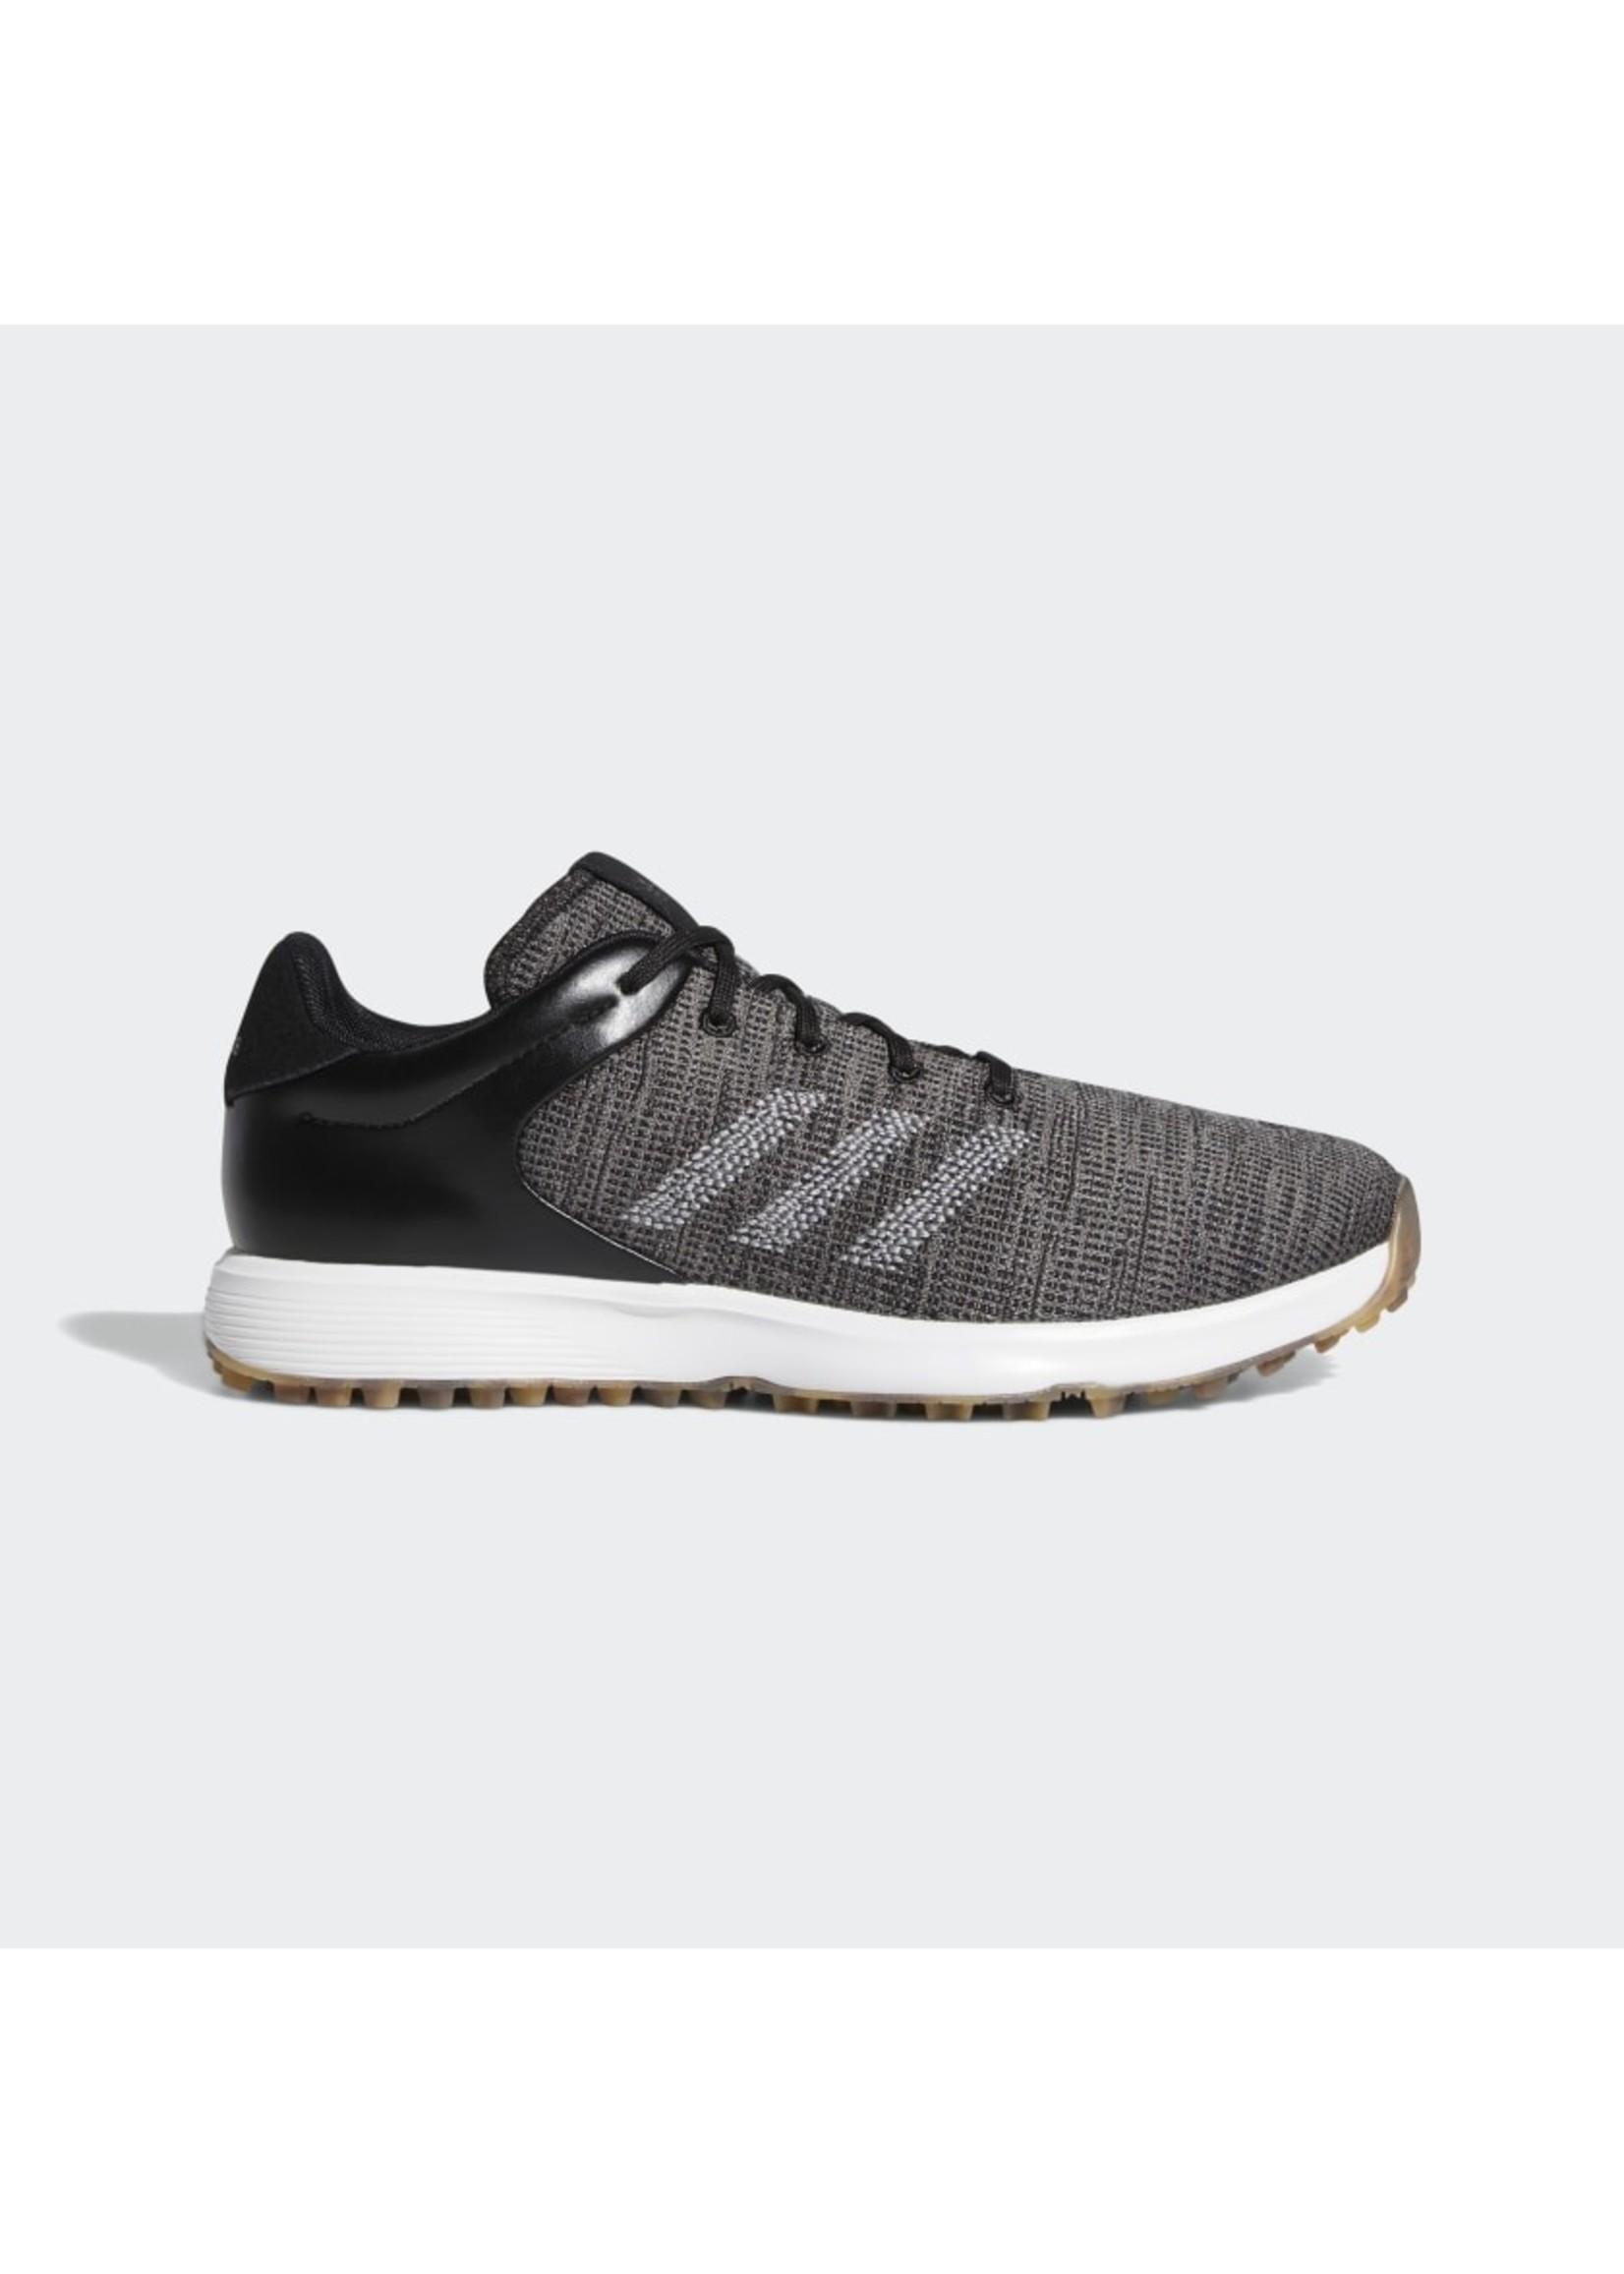 Adidas Adidas S2G Mens Golf Shoes (2020)